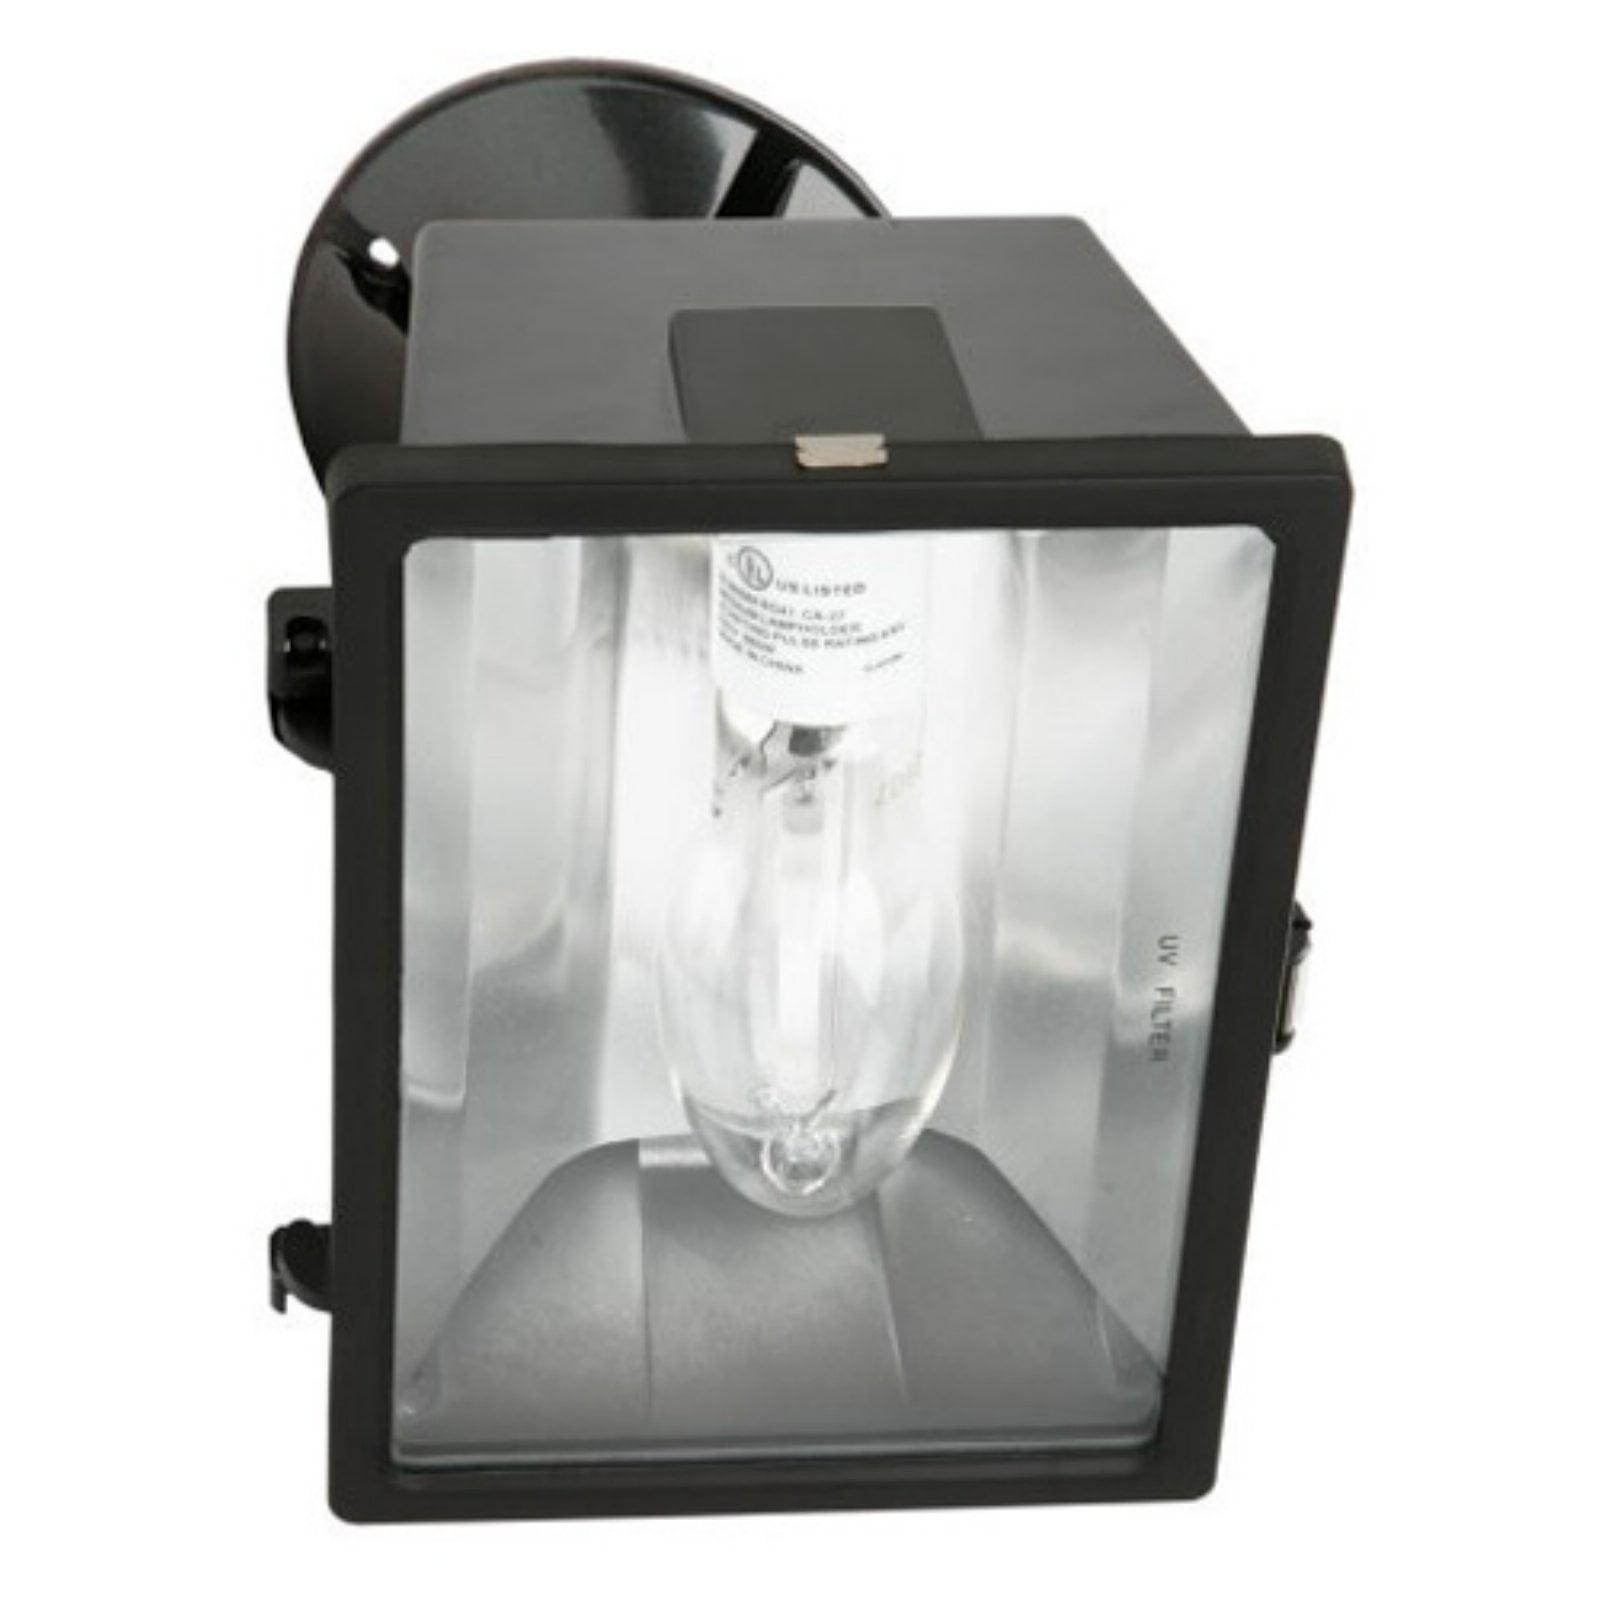 Designers Edge L-1760HPS 150W High Pressure Sodium Commercial Flood Light by Designers Edge